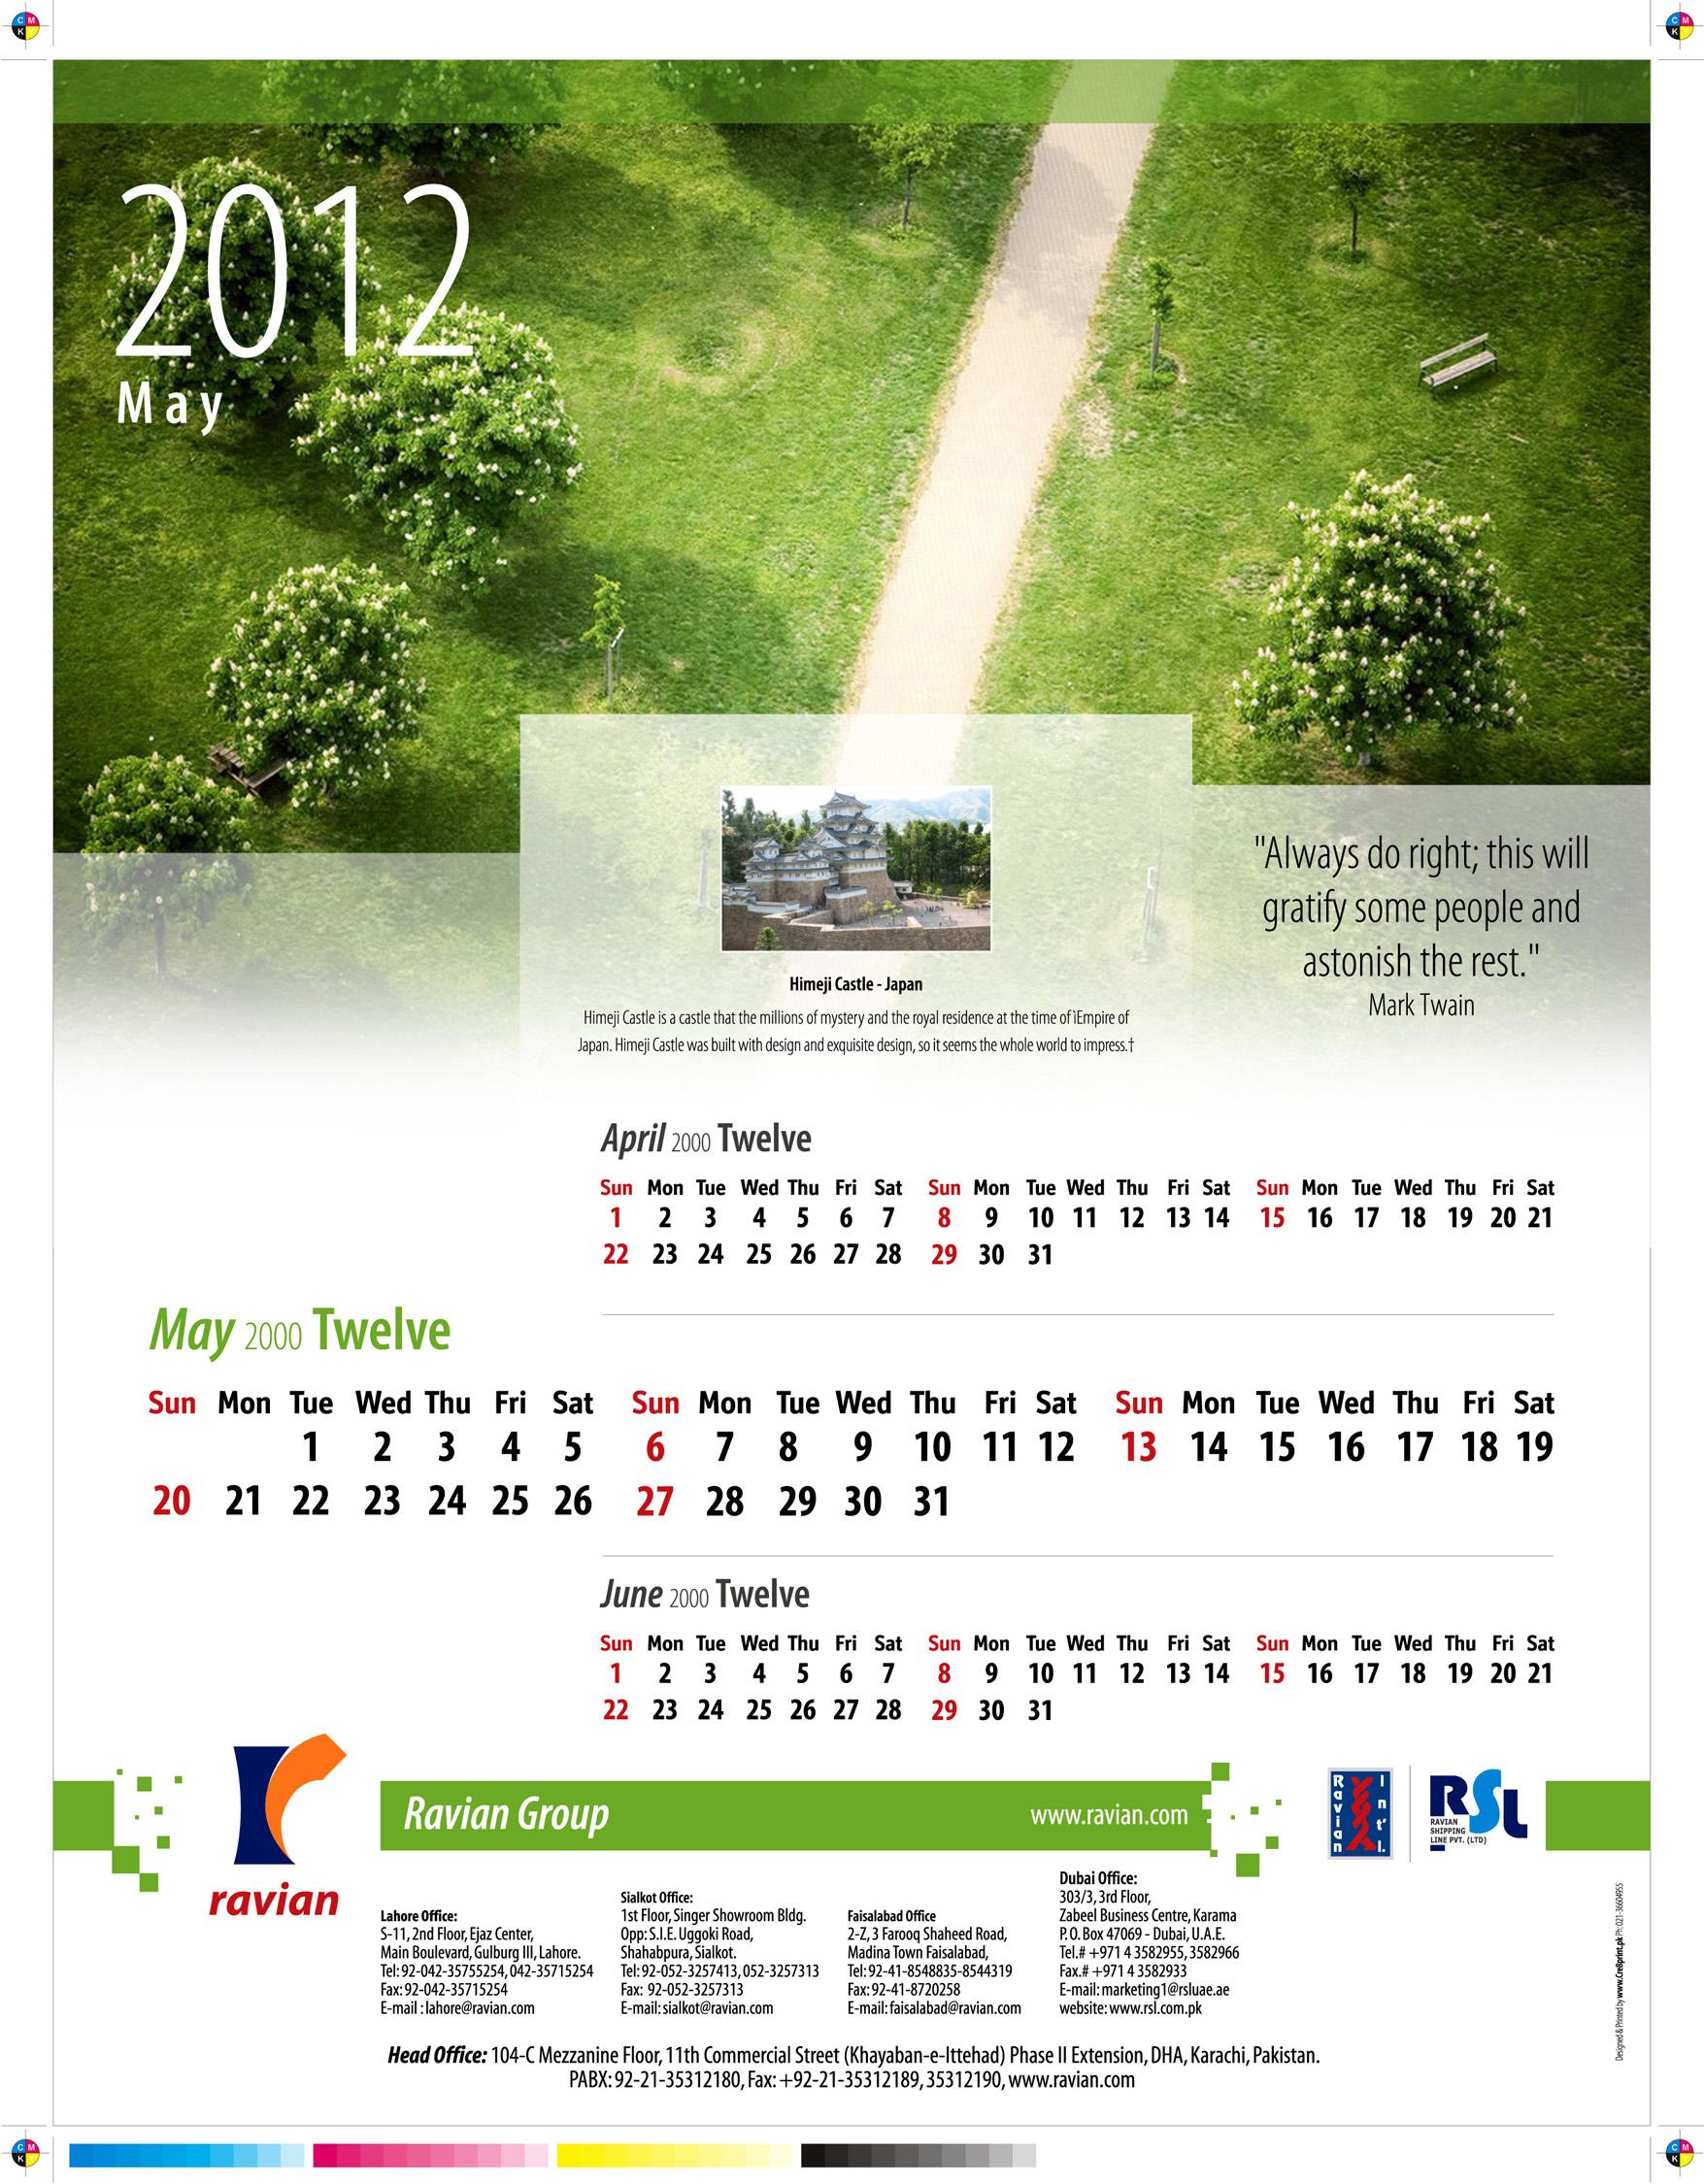 Corporate Calendar Designs : Calendar designs by kamran akhlaq at coroflot